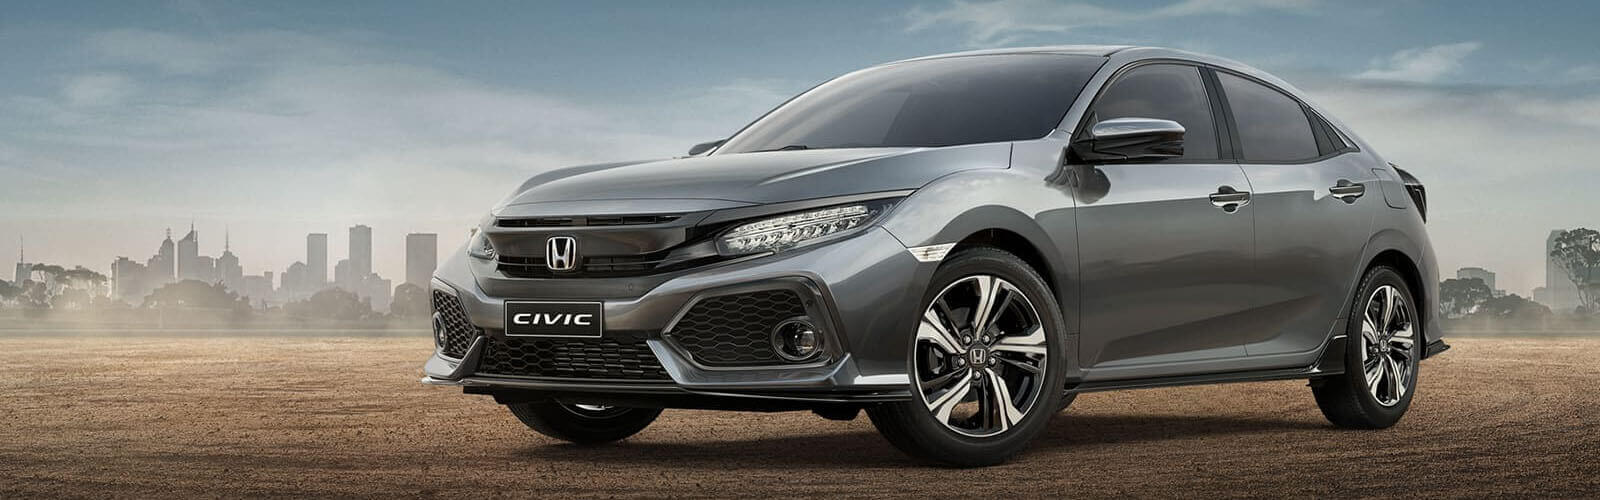 New Honda Civic Hatch For Sale In Sunshine Coast Cricks Honda